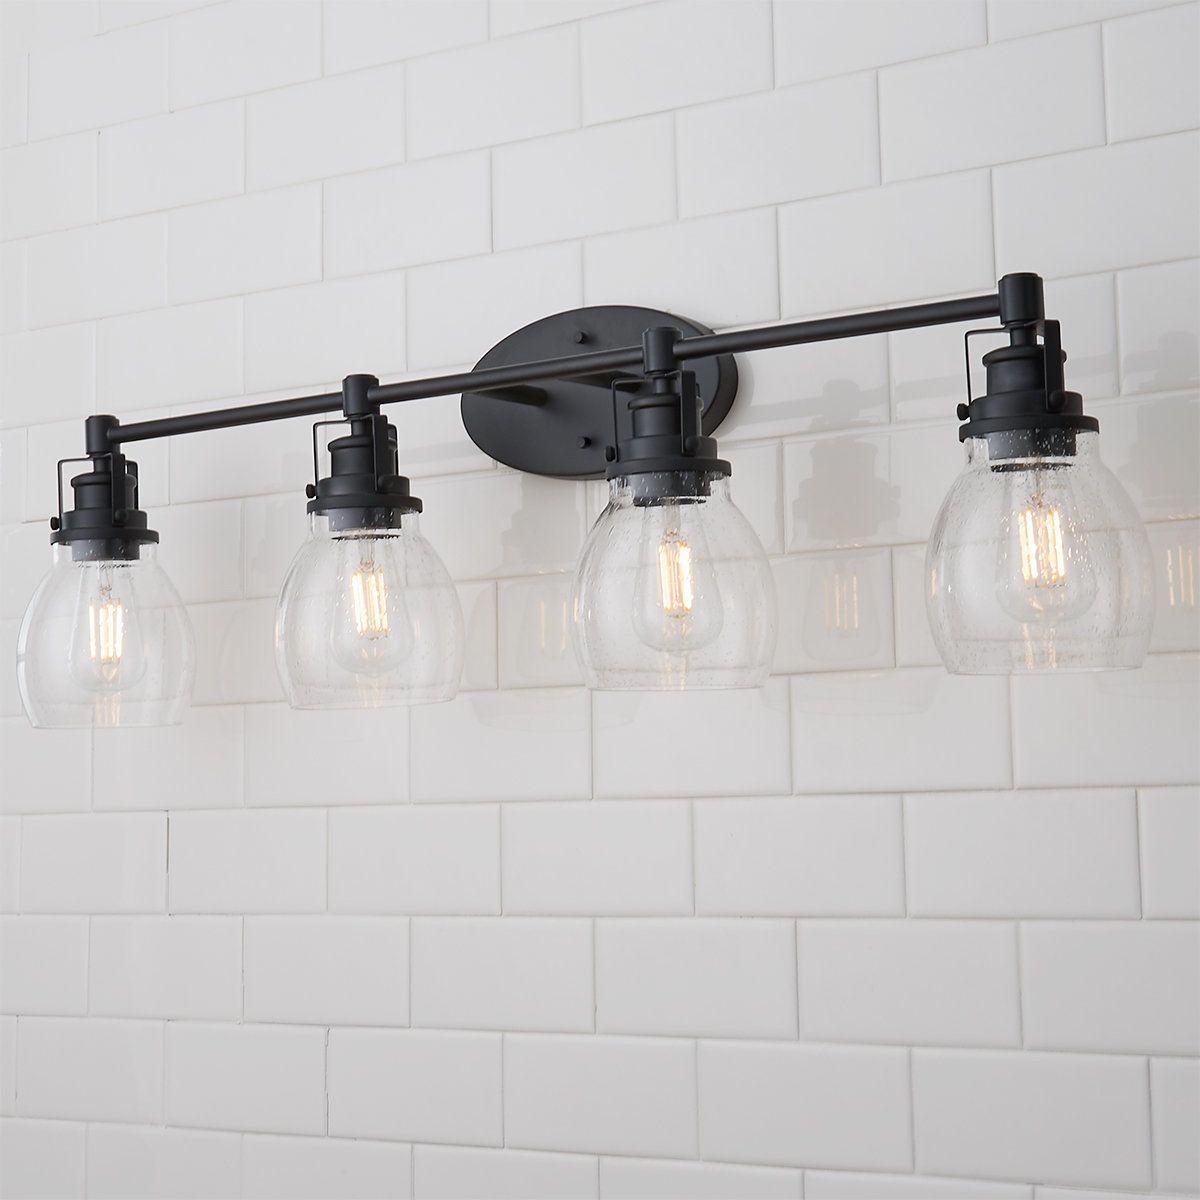 Soft Seeded Vanity Light 4 Light In 2021 Farmhouse Bathroom Light Rustic Bathroom Lighting Bathroom Light Fixtures